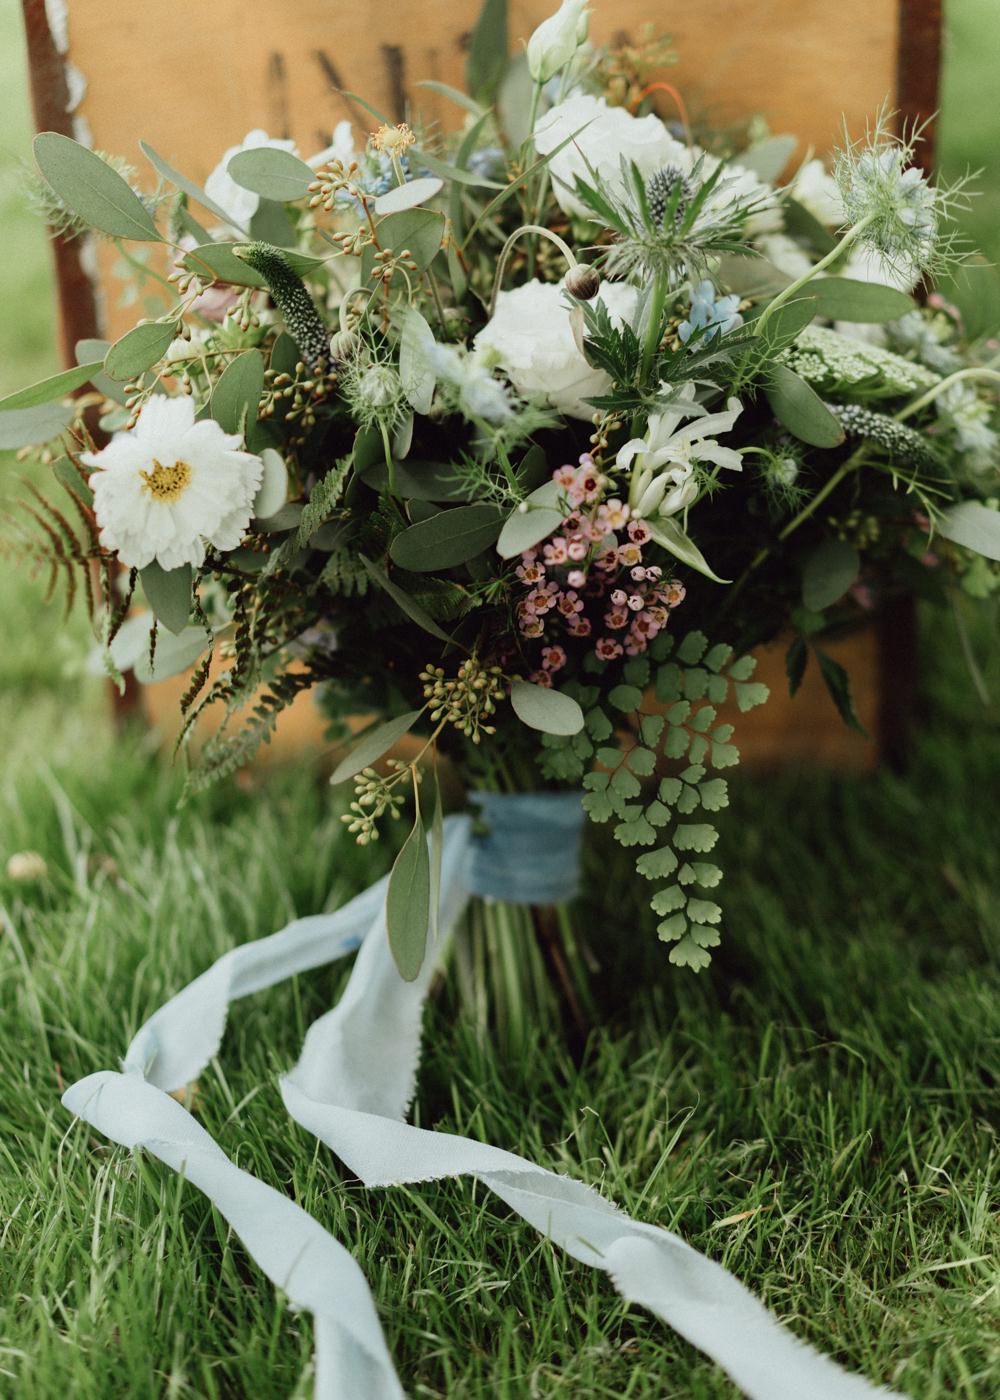 Bouquet Flowers Bride Bridal Thistle Greenery Ribbon Pitt Hall Barn Wedding Emily & Steve Photography